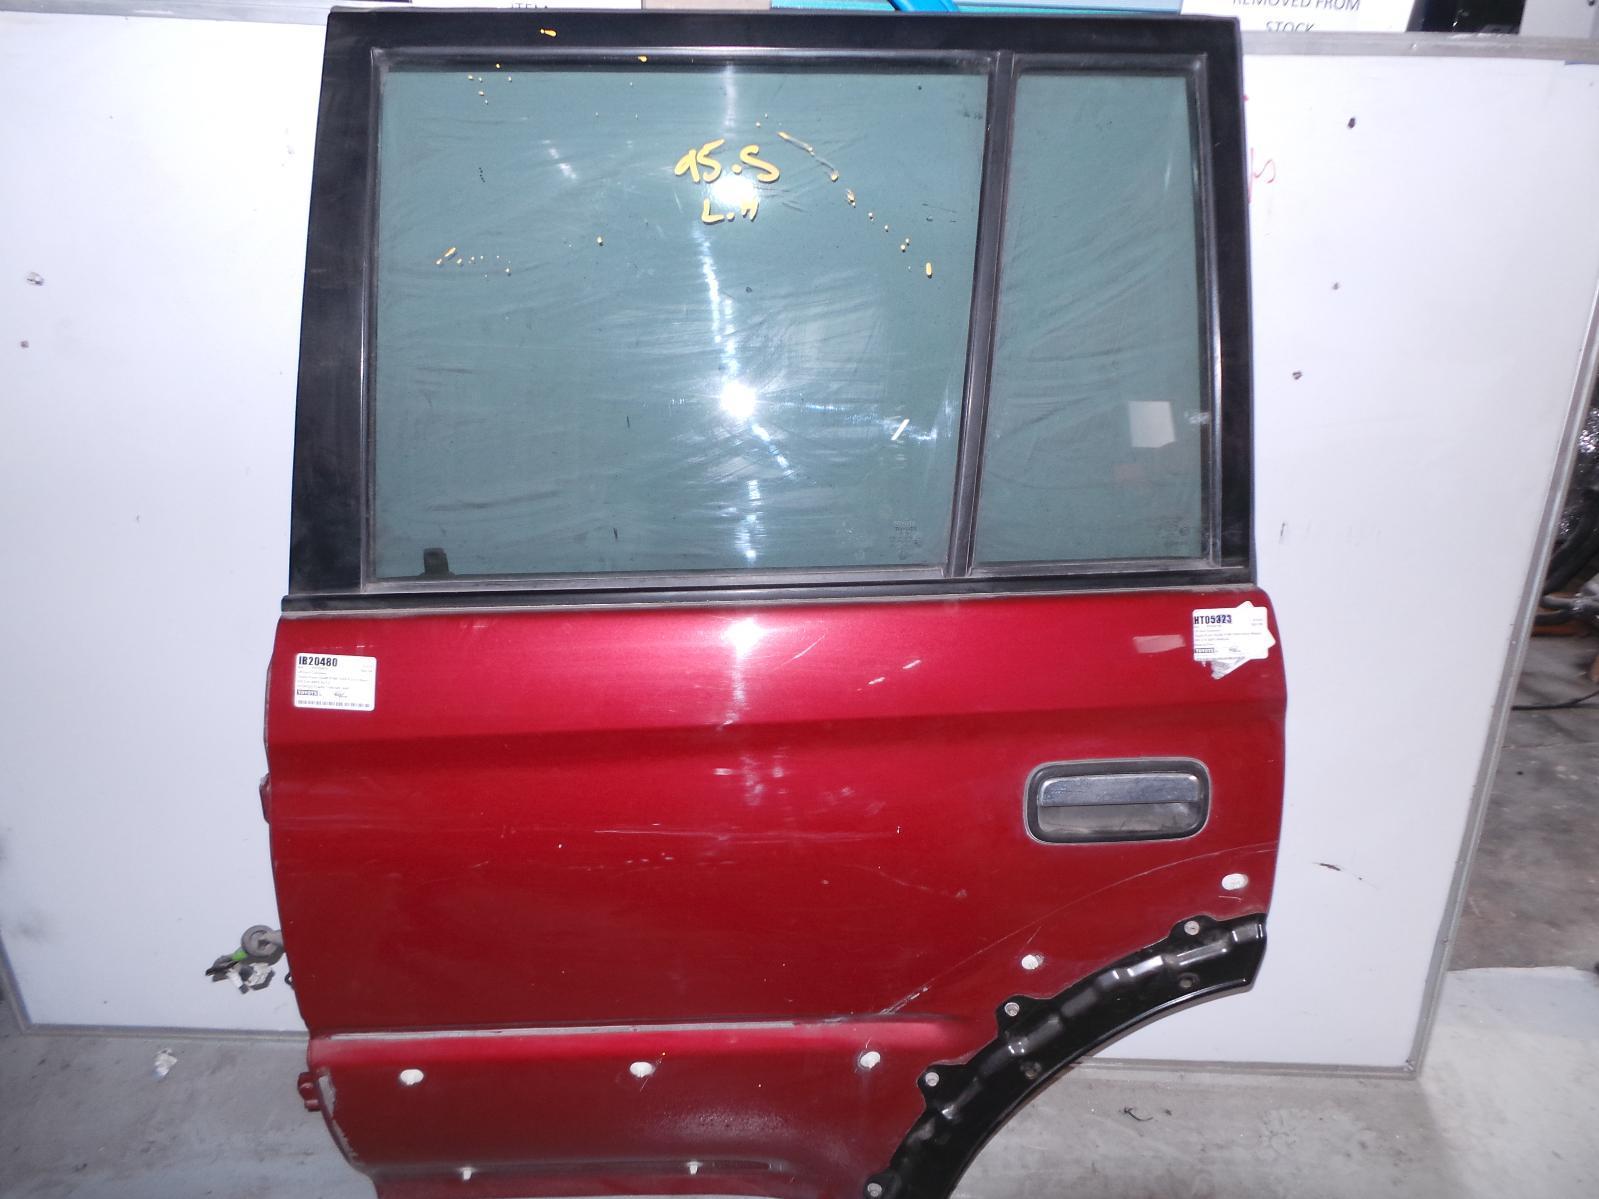 TOYOTA PRADO, Left Rear Door/Sliding, 95 SERIES, W/ MOULD TYPE, 07/96-01/03